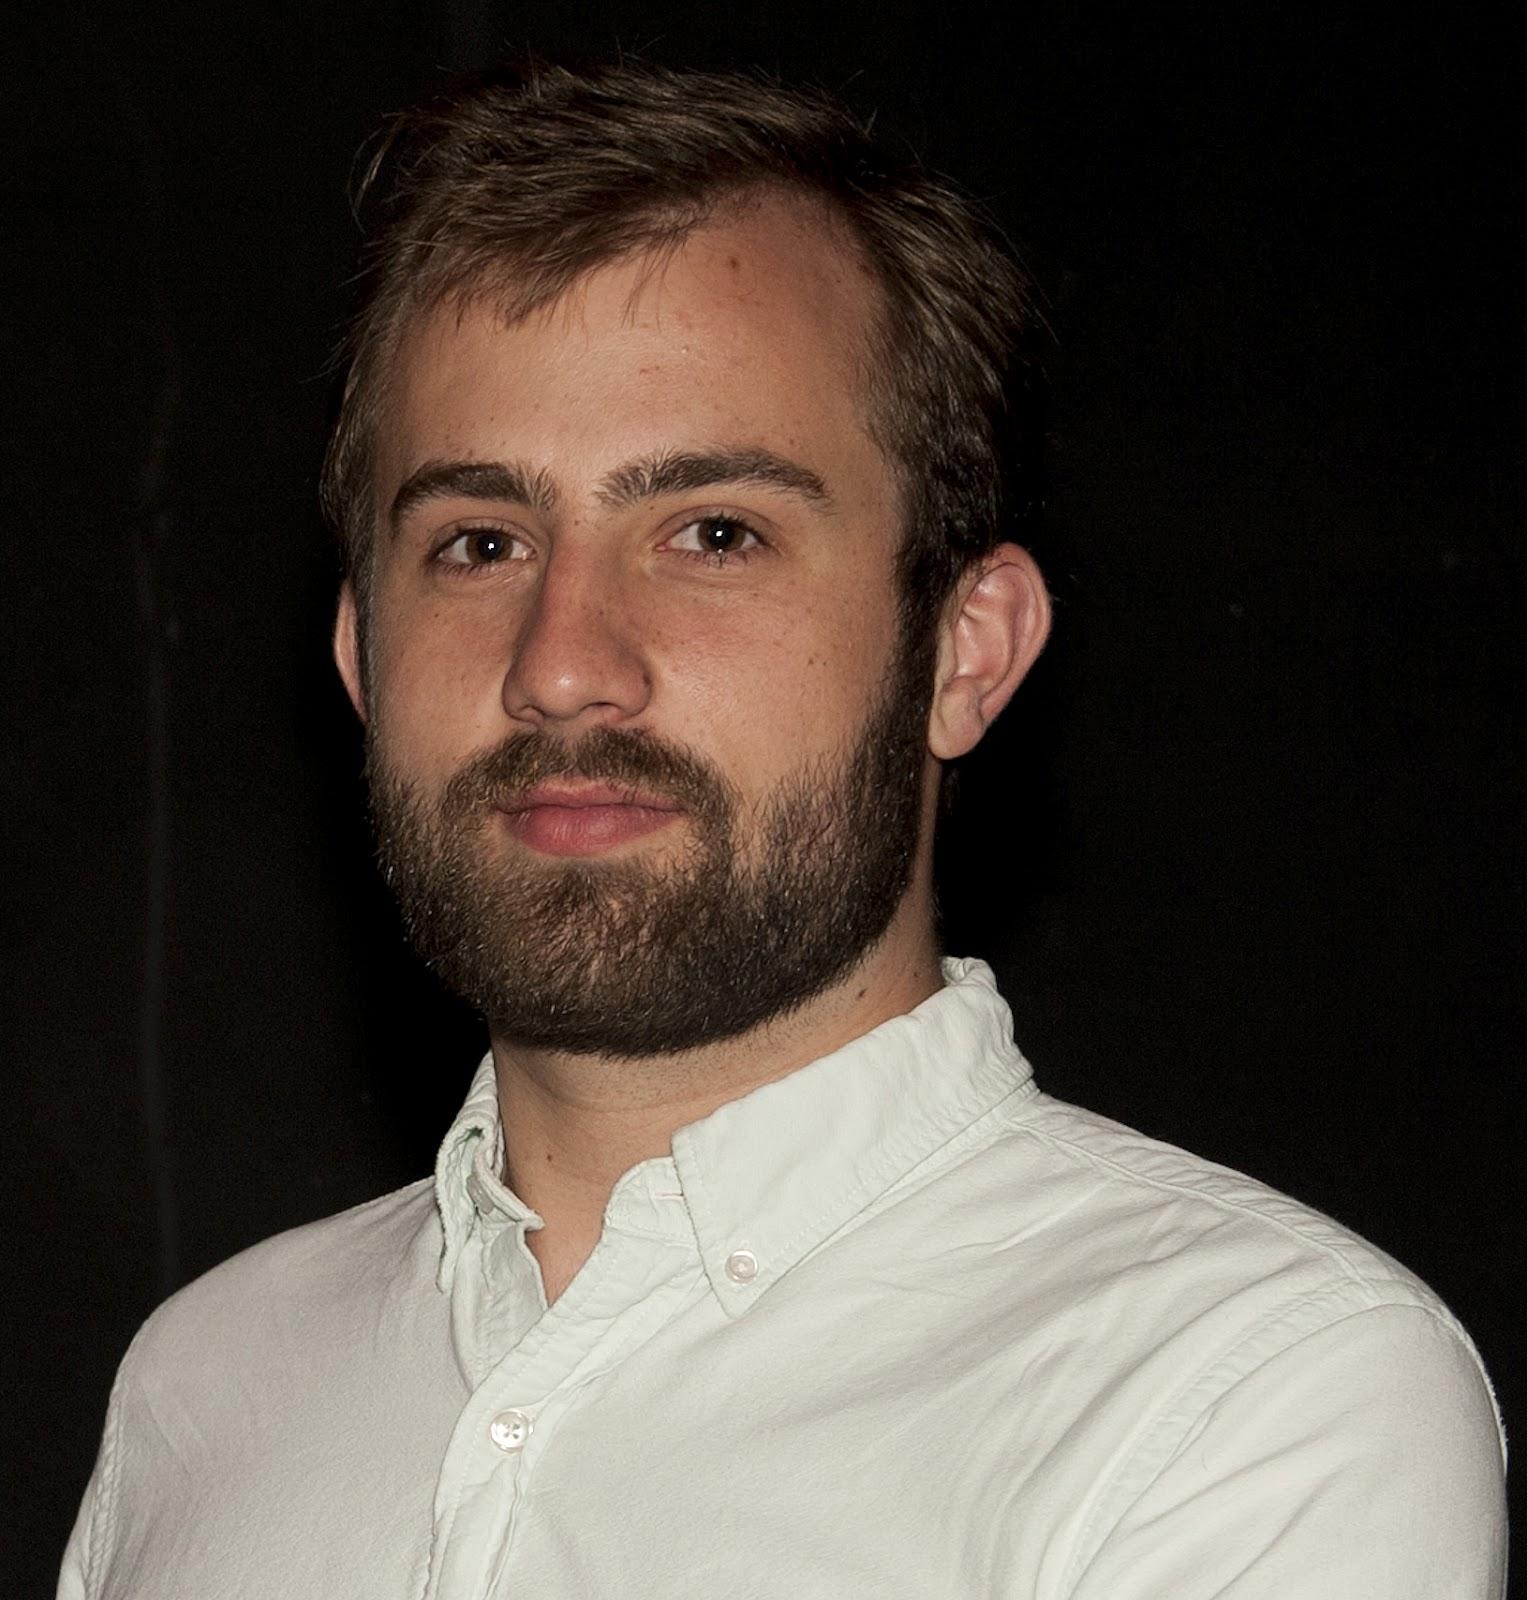 adam szymkowicz  i interview playwrights part 480 colby day